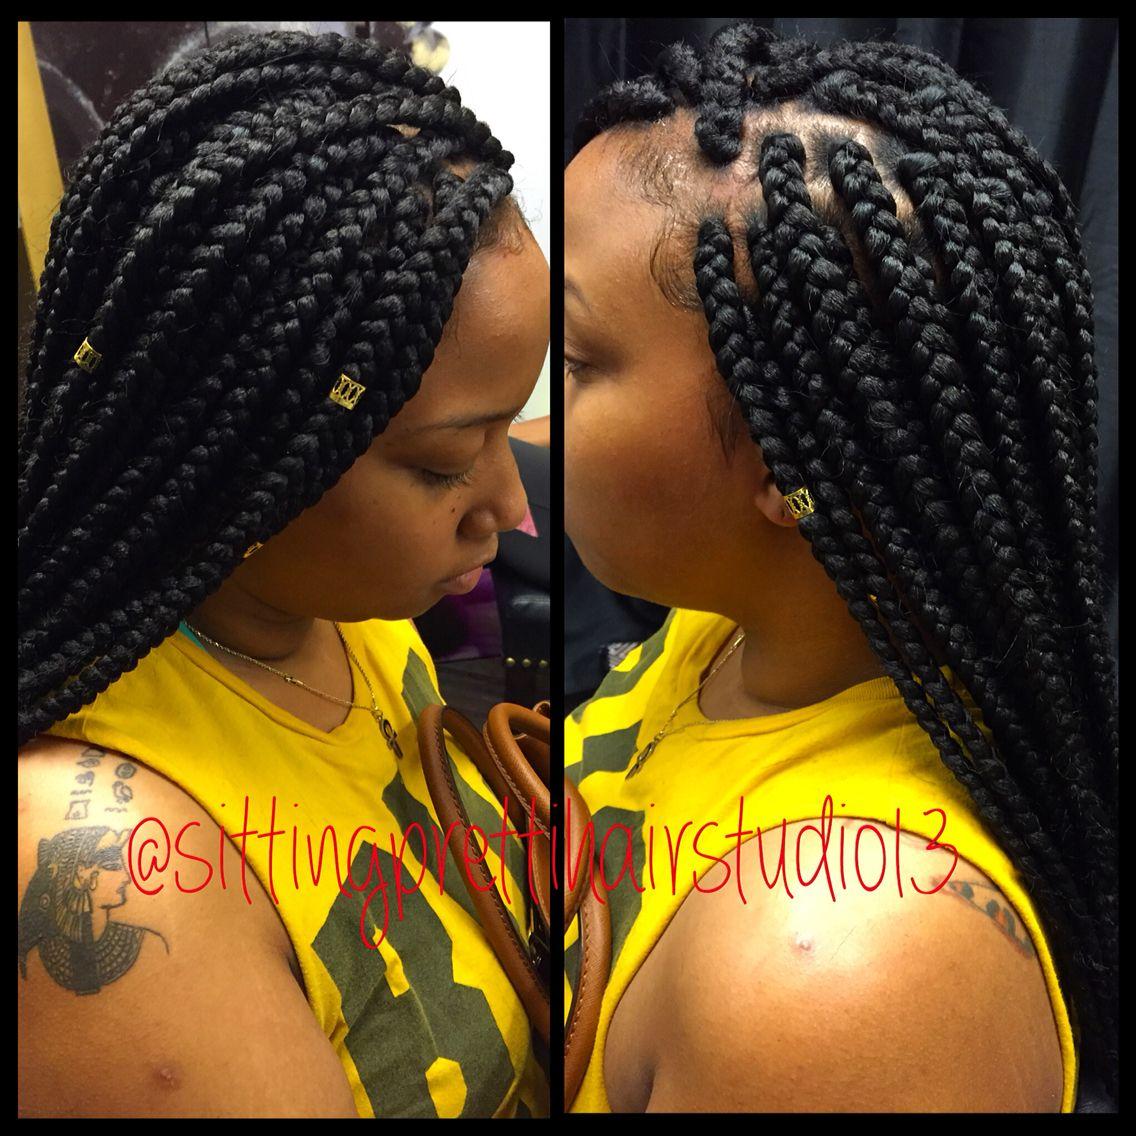 Box braids Thick braids Poetic justice braids Gold beads ...